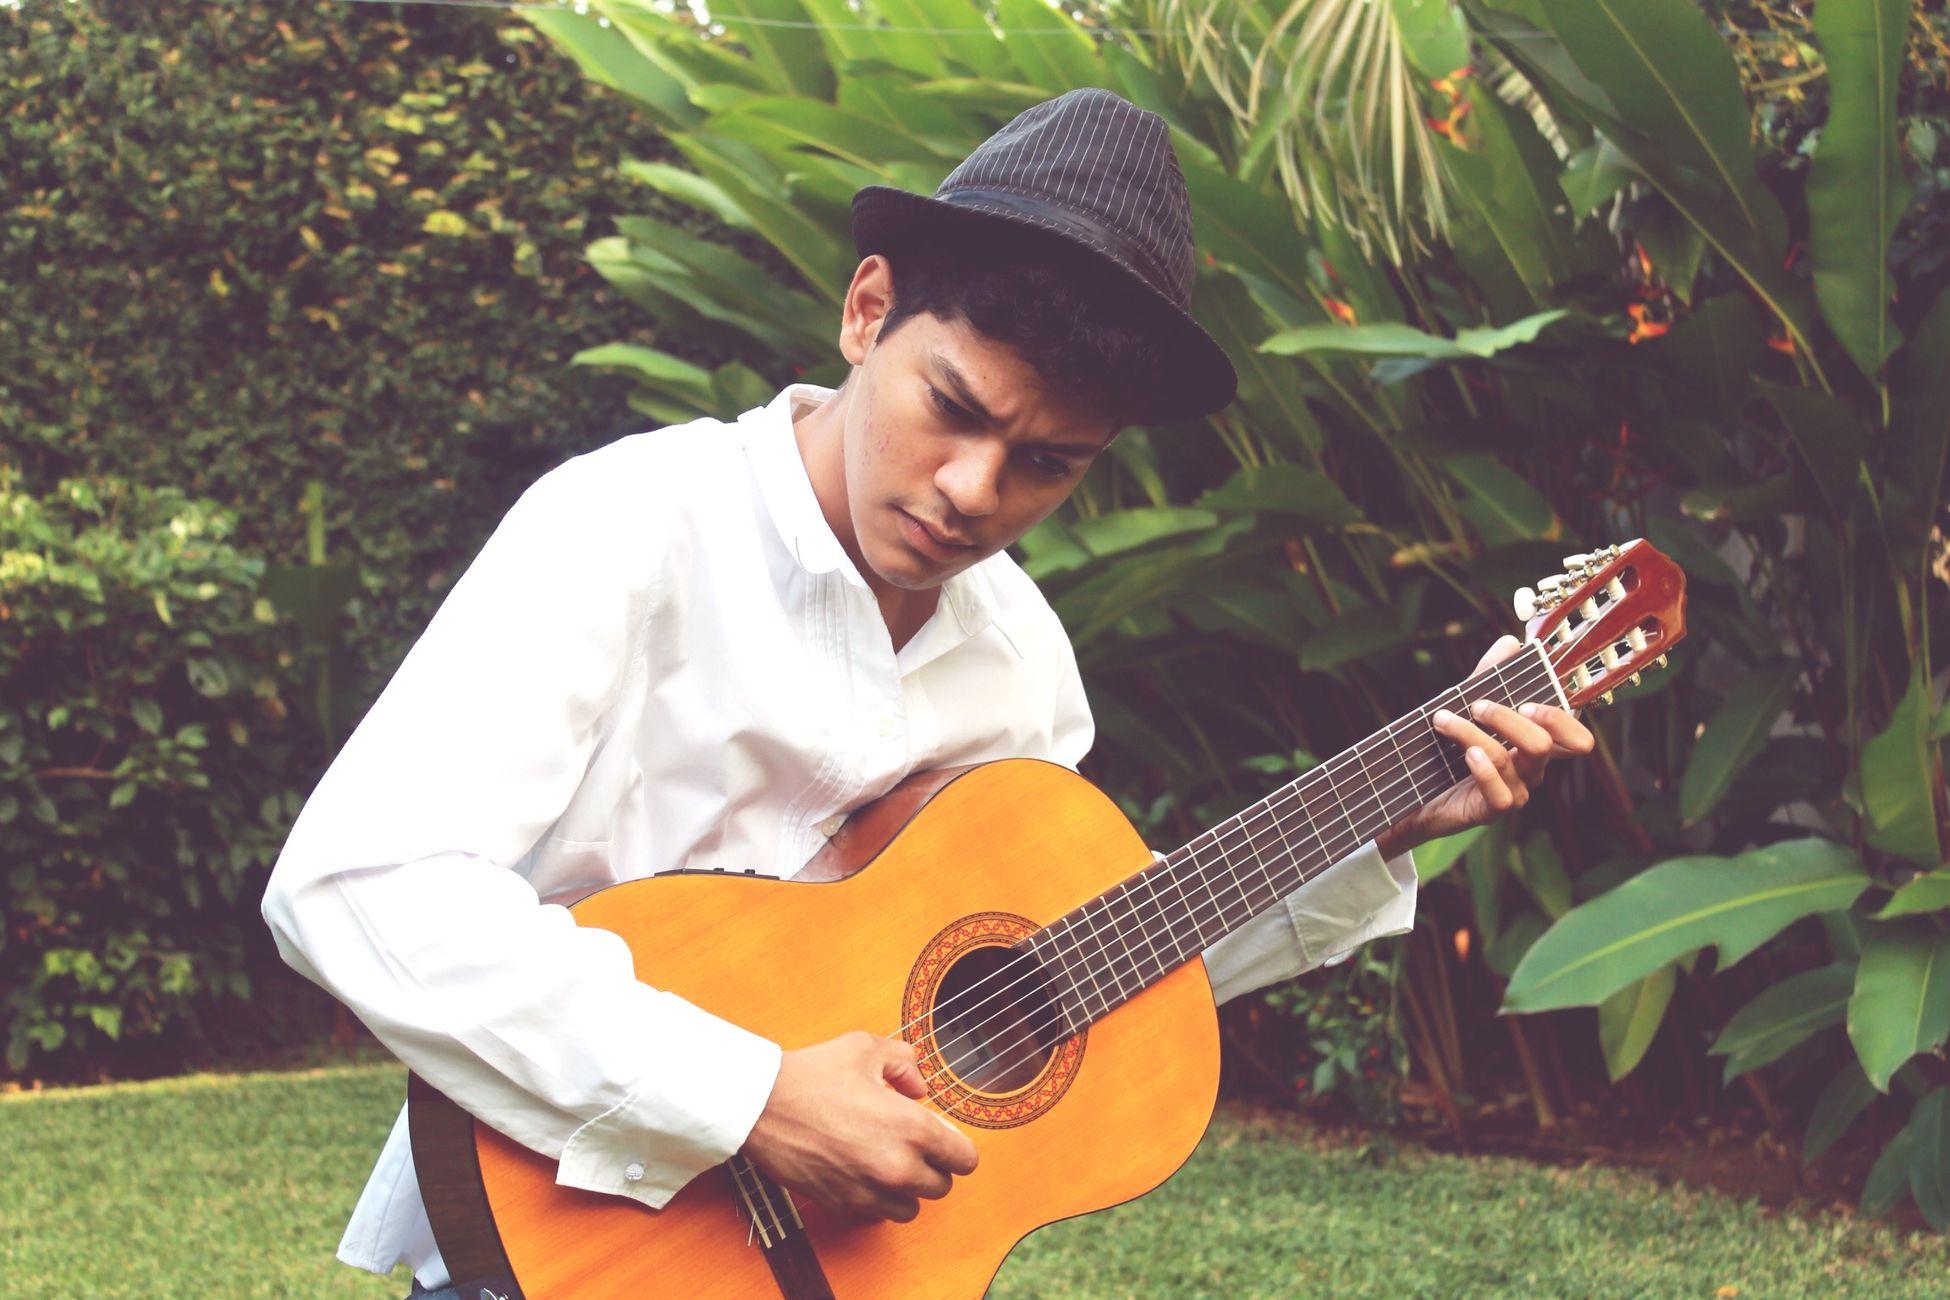 Acoustic Guitar Green Leaves That's Me Flamenco FlamencoLover Credits: Benjamln Aviles 🎸🎶